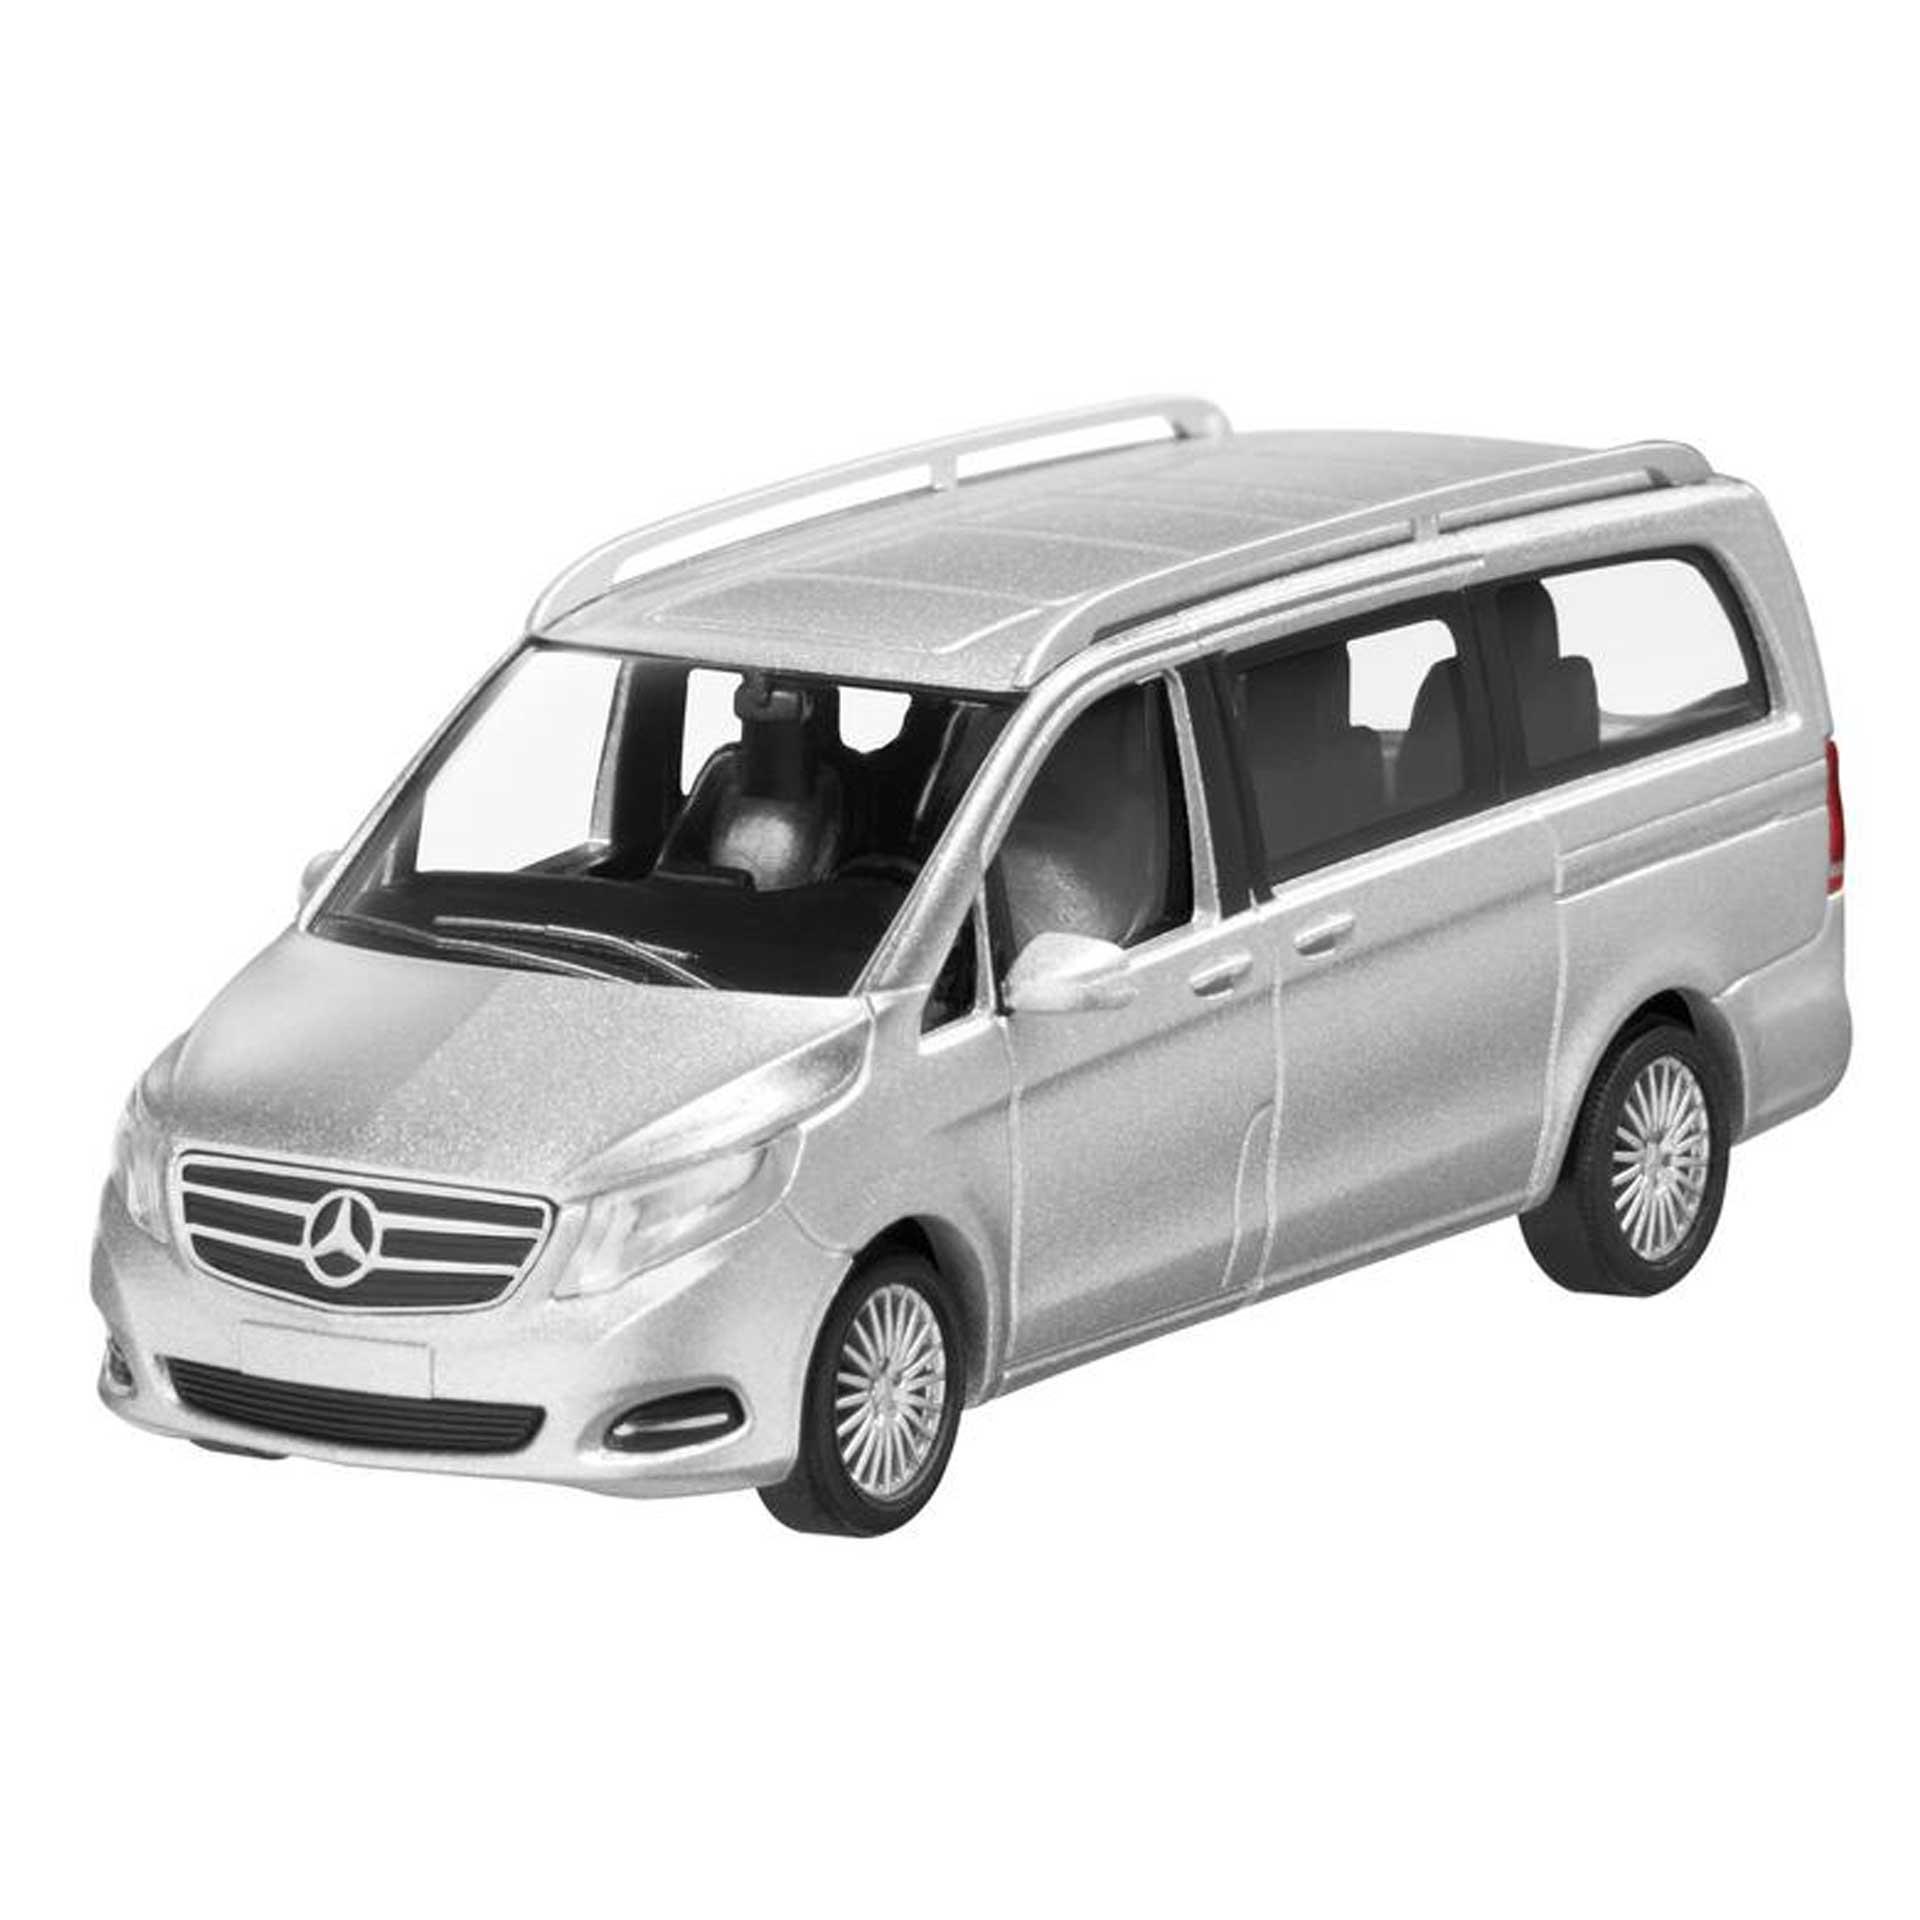 Mercedes-Benz Modellauto V-Klasse BR447 1:87 brillantsilber